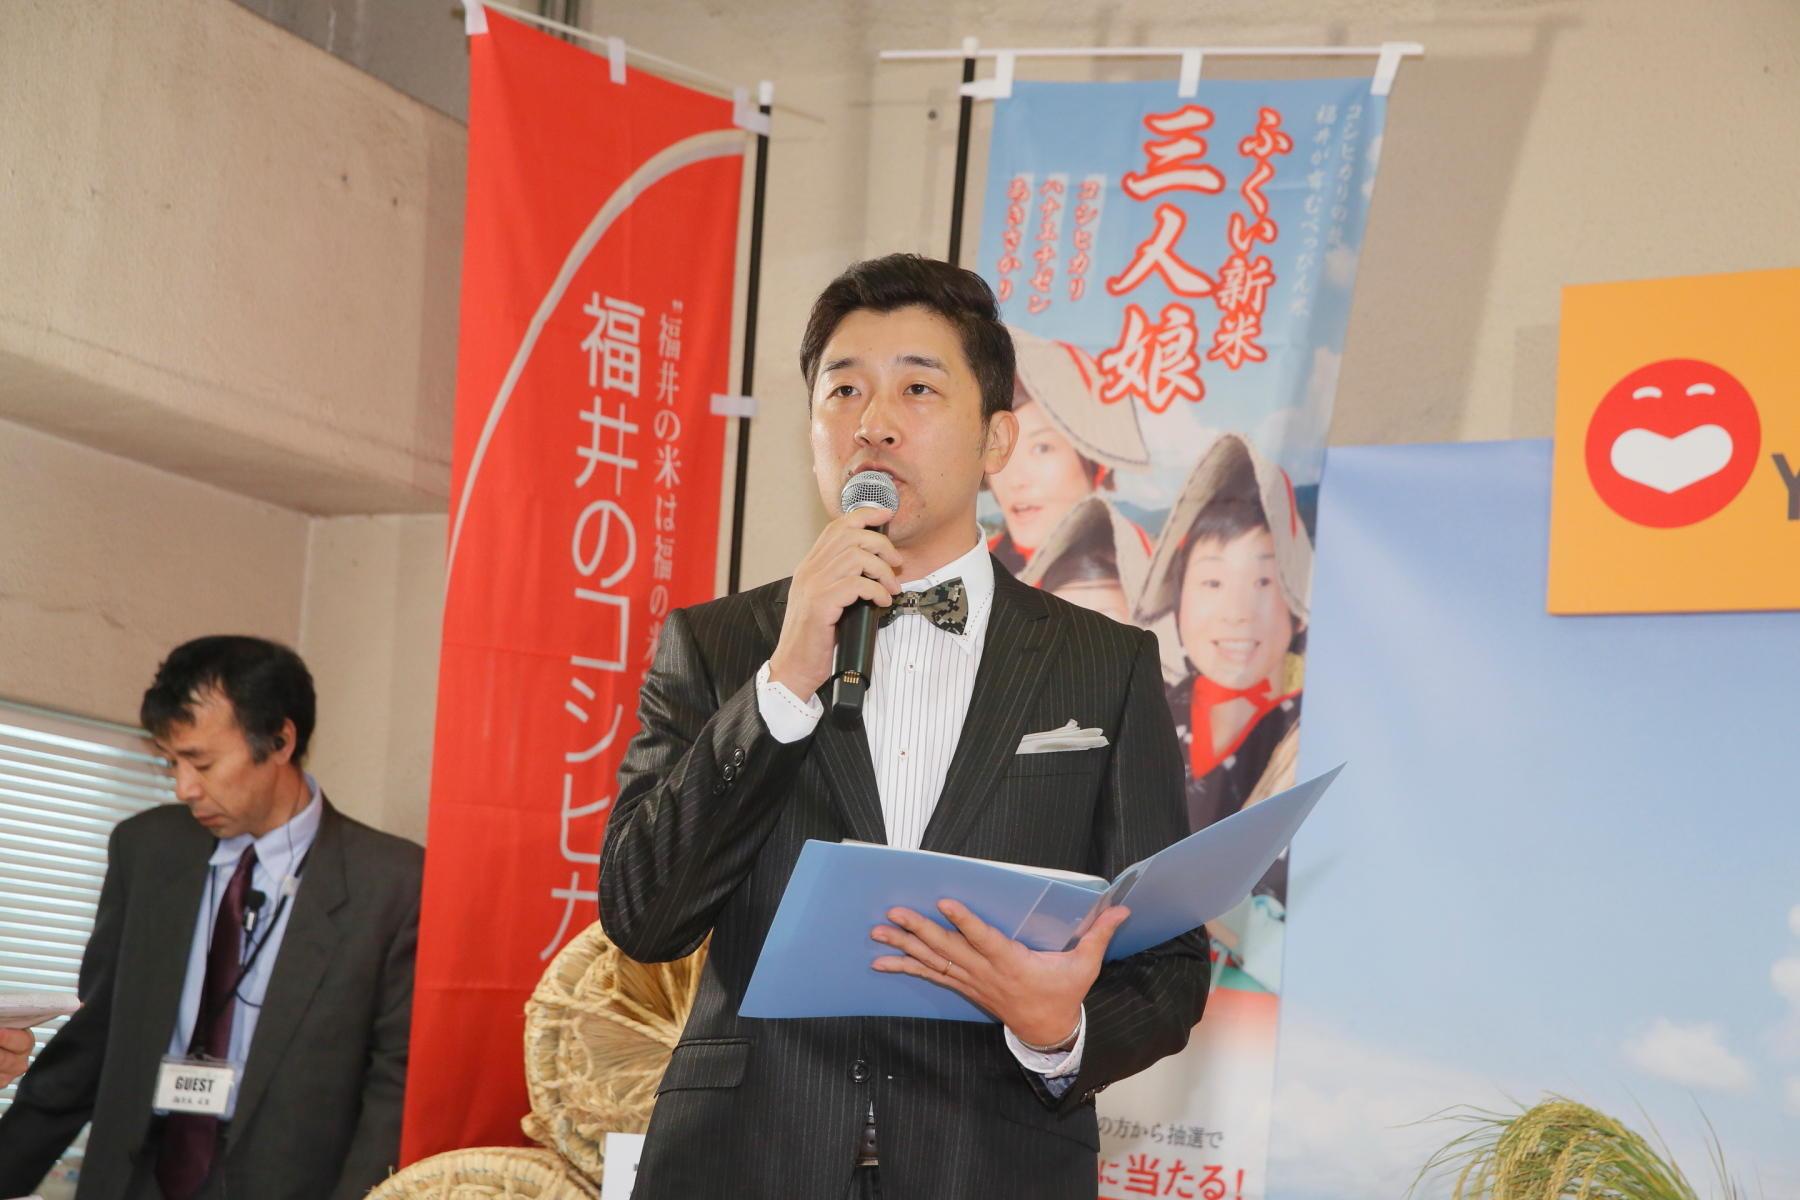 http://news.yoshimoto.co.jp/20160831143827-dc6f214cbfc14f48d5f4c4a71233f2def08499d5.jpg